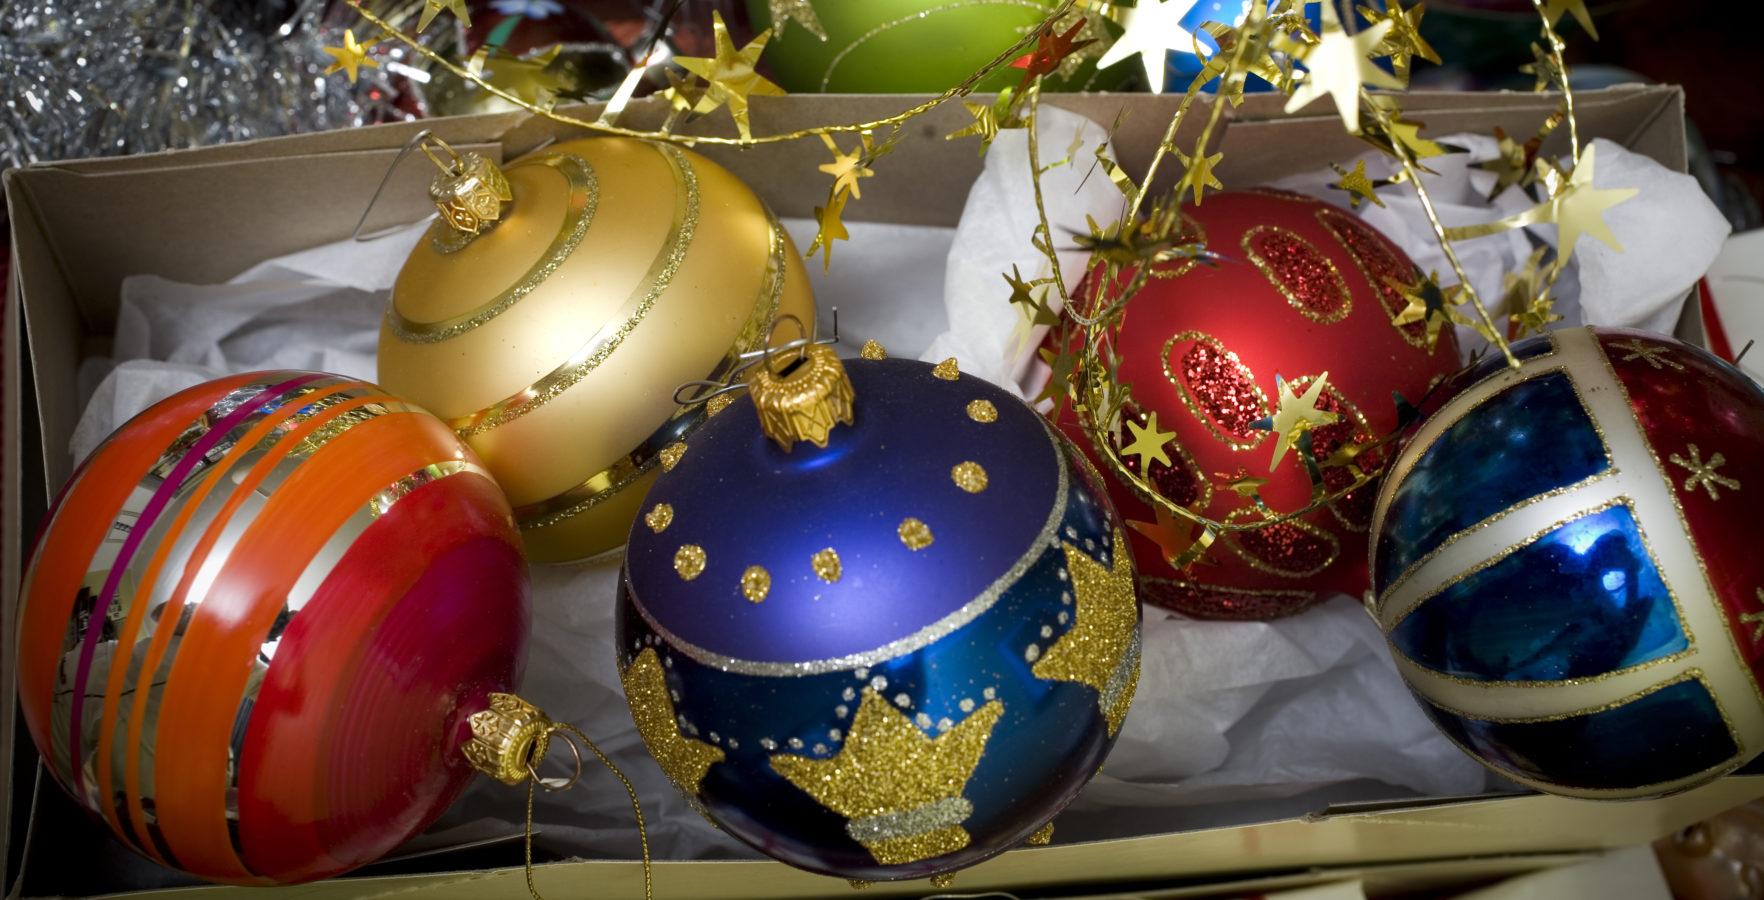 Christmas Decoration,  Close-Up Of Christmas Tree Balls  (Julpynt,  julgranskulor,  närbild)